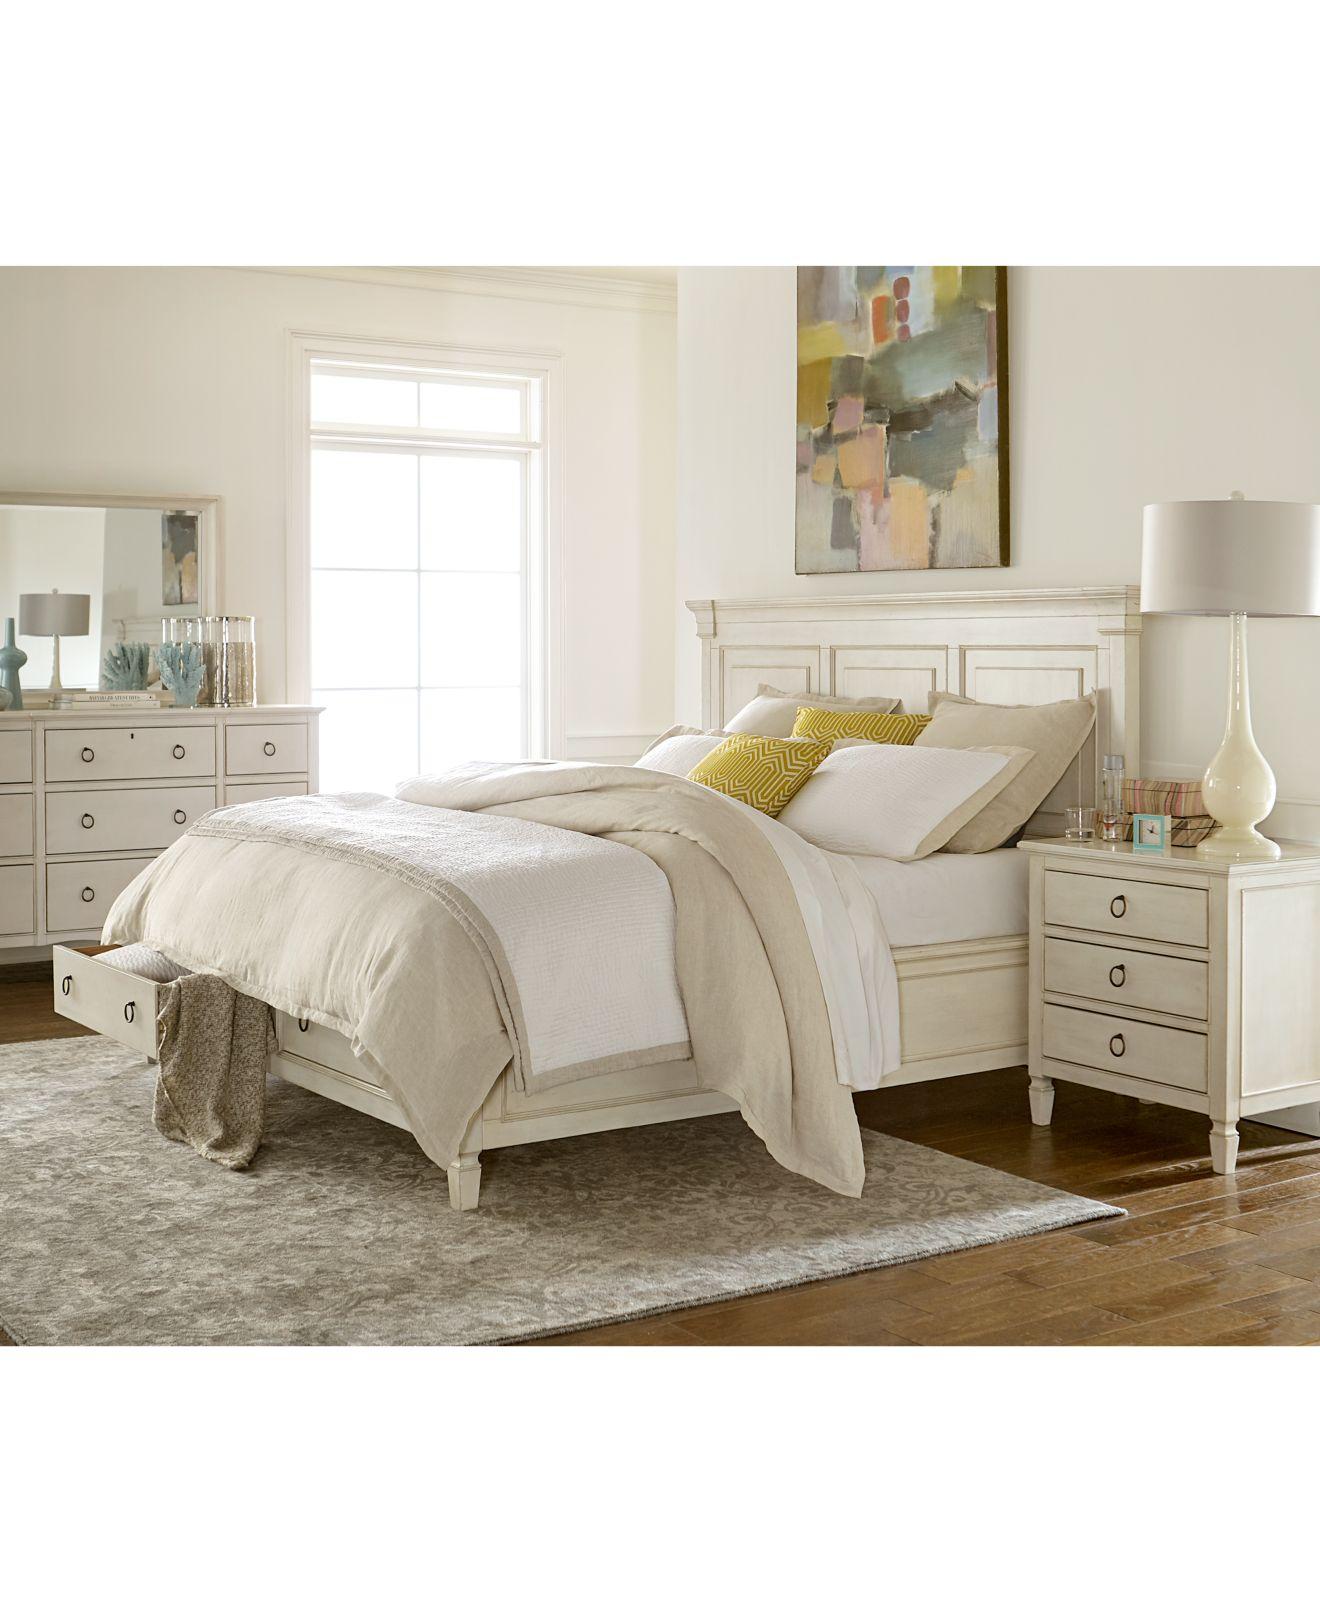 Modern bedroom set by macys